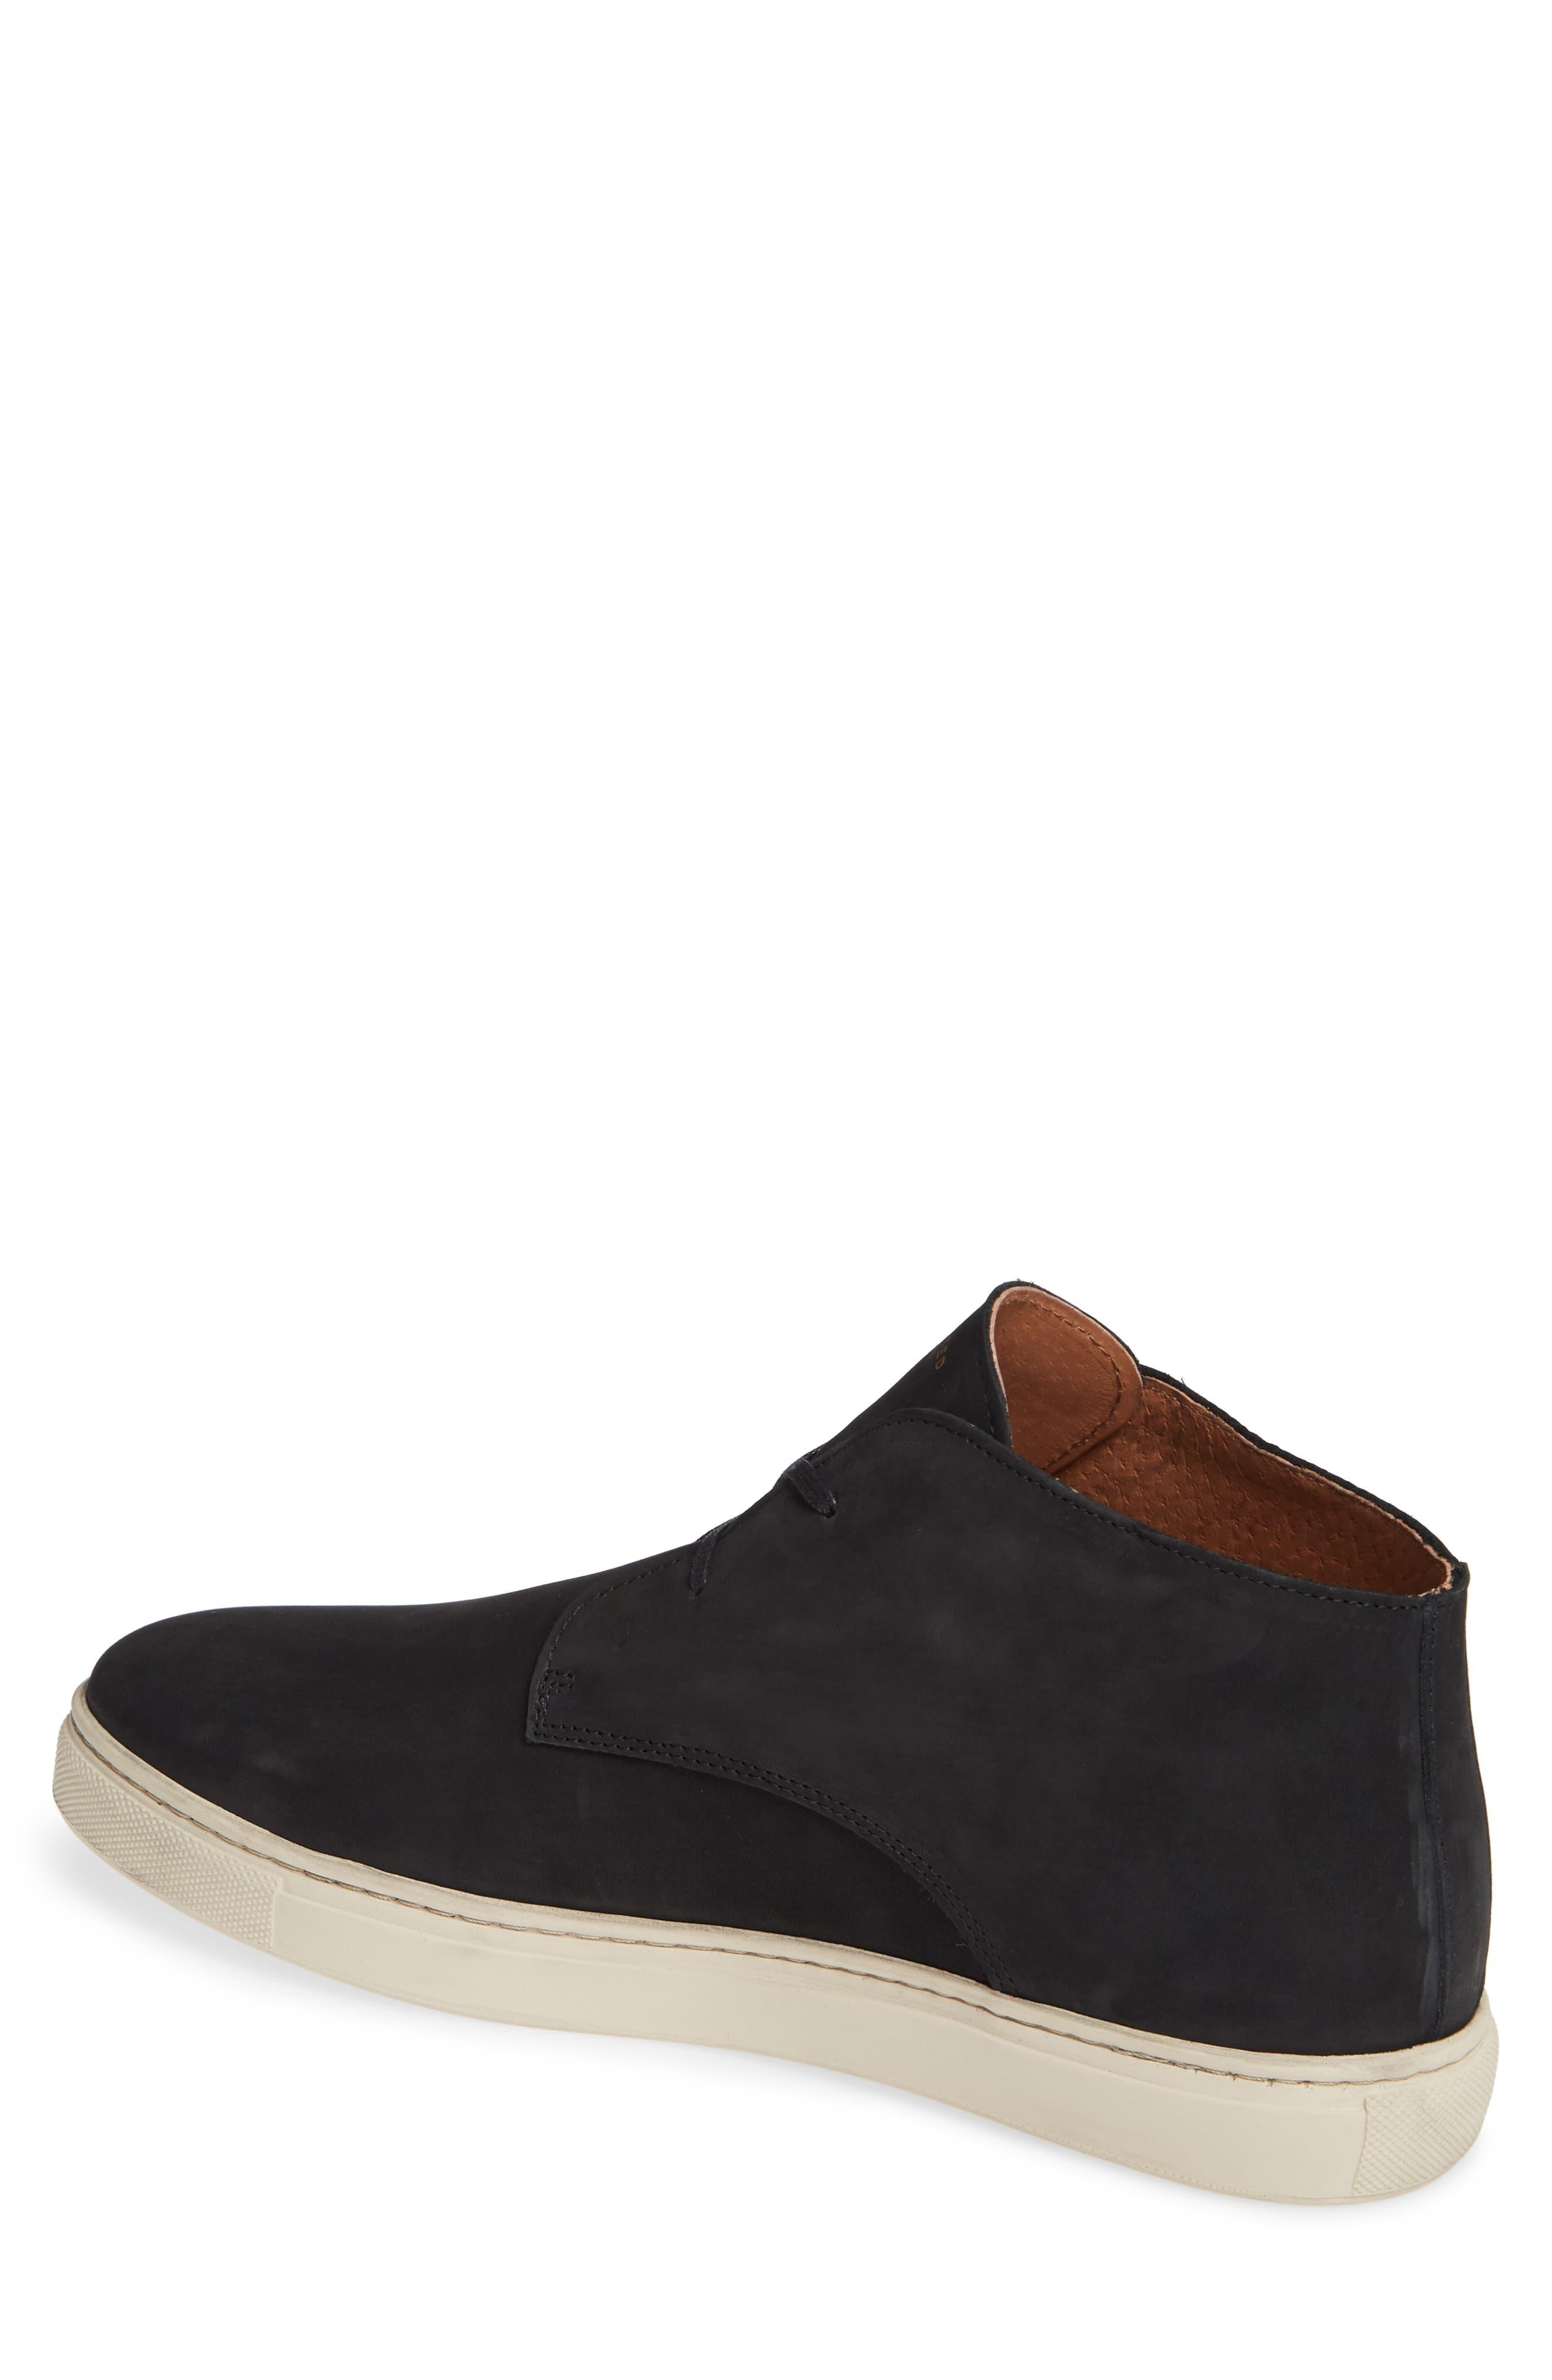 Dempsey Chukka Sneaker,                             Alternate thumbnail 2, color,                             BLACK